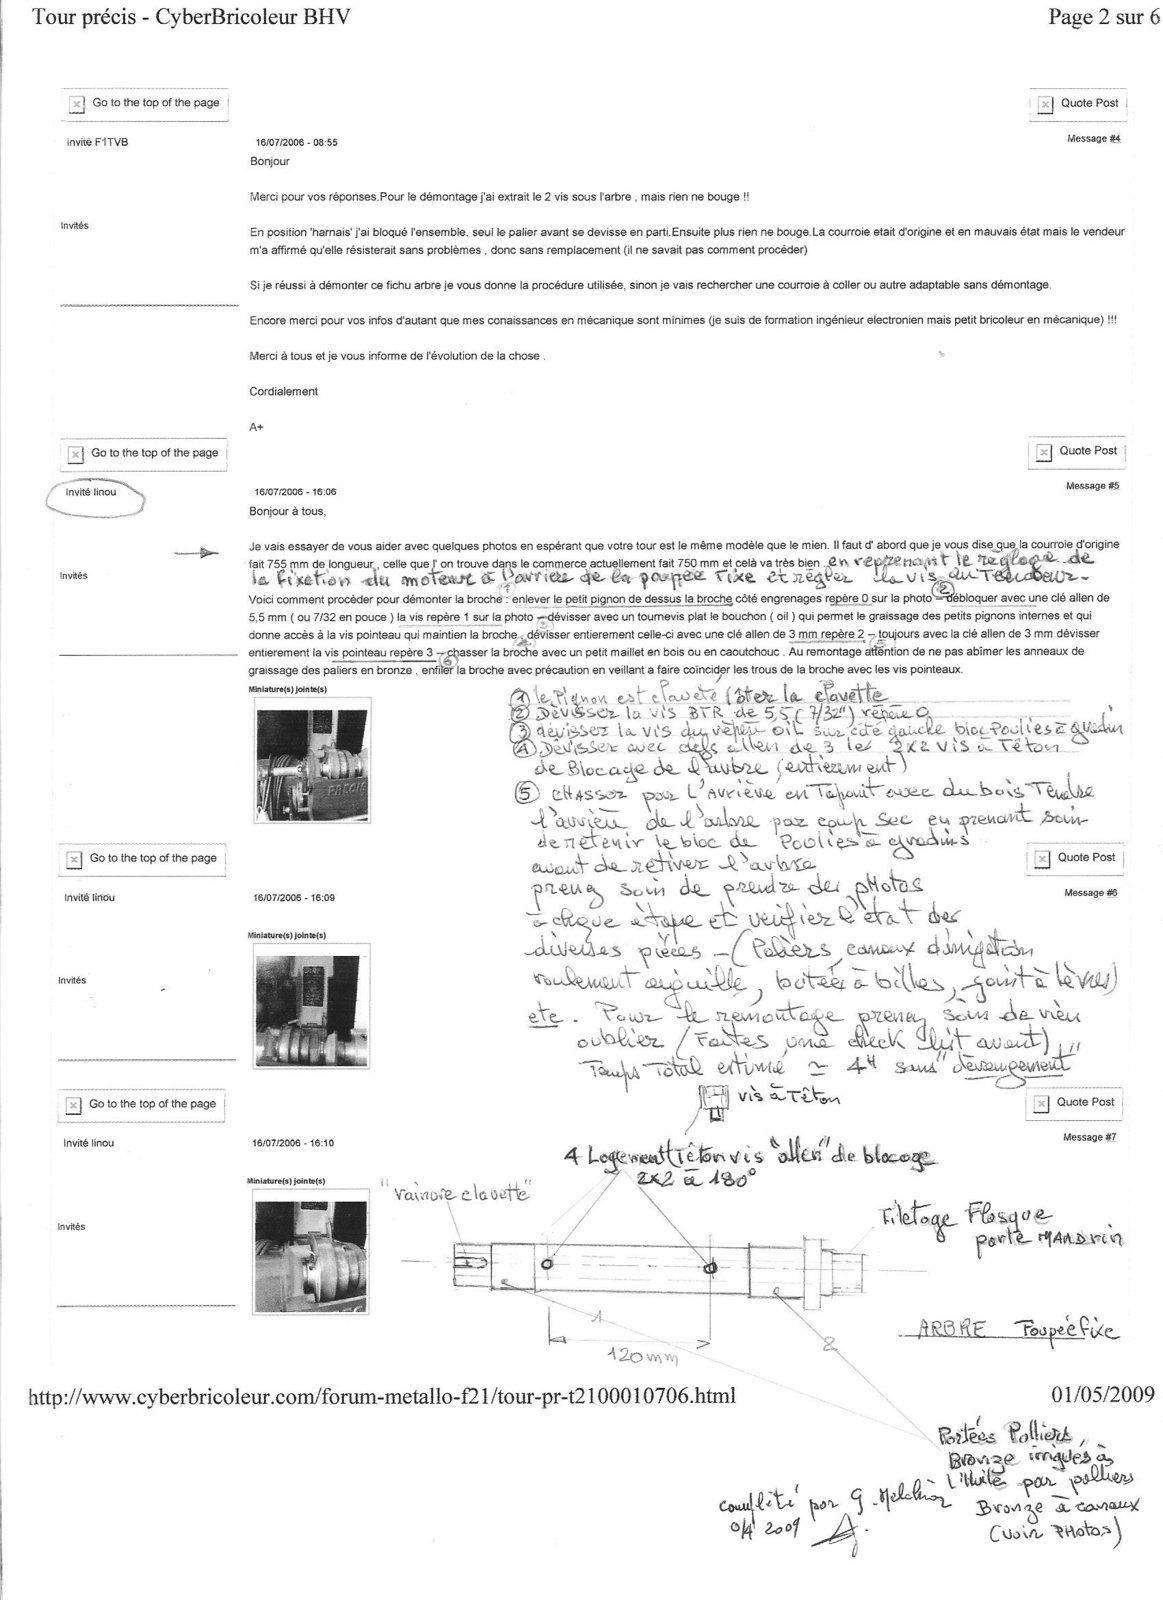 Procedure chgt courroie tour PRECIS E &EB.jpg